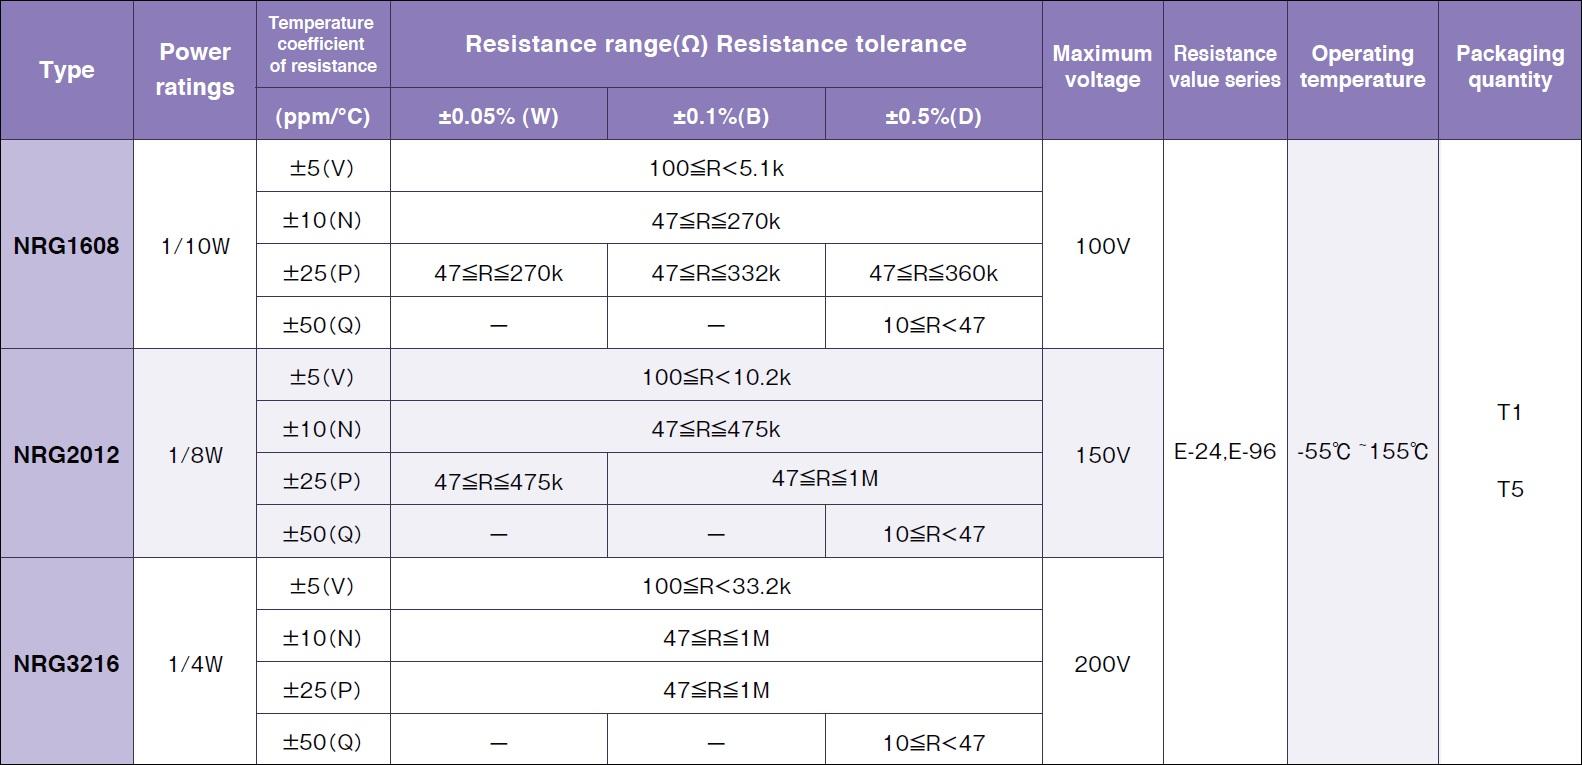 Susumu NRG2012 Specifications